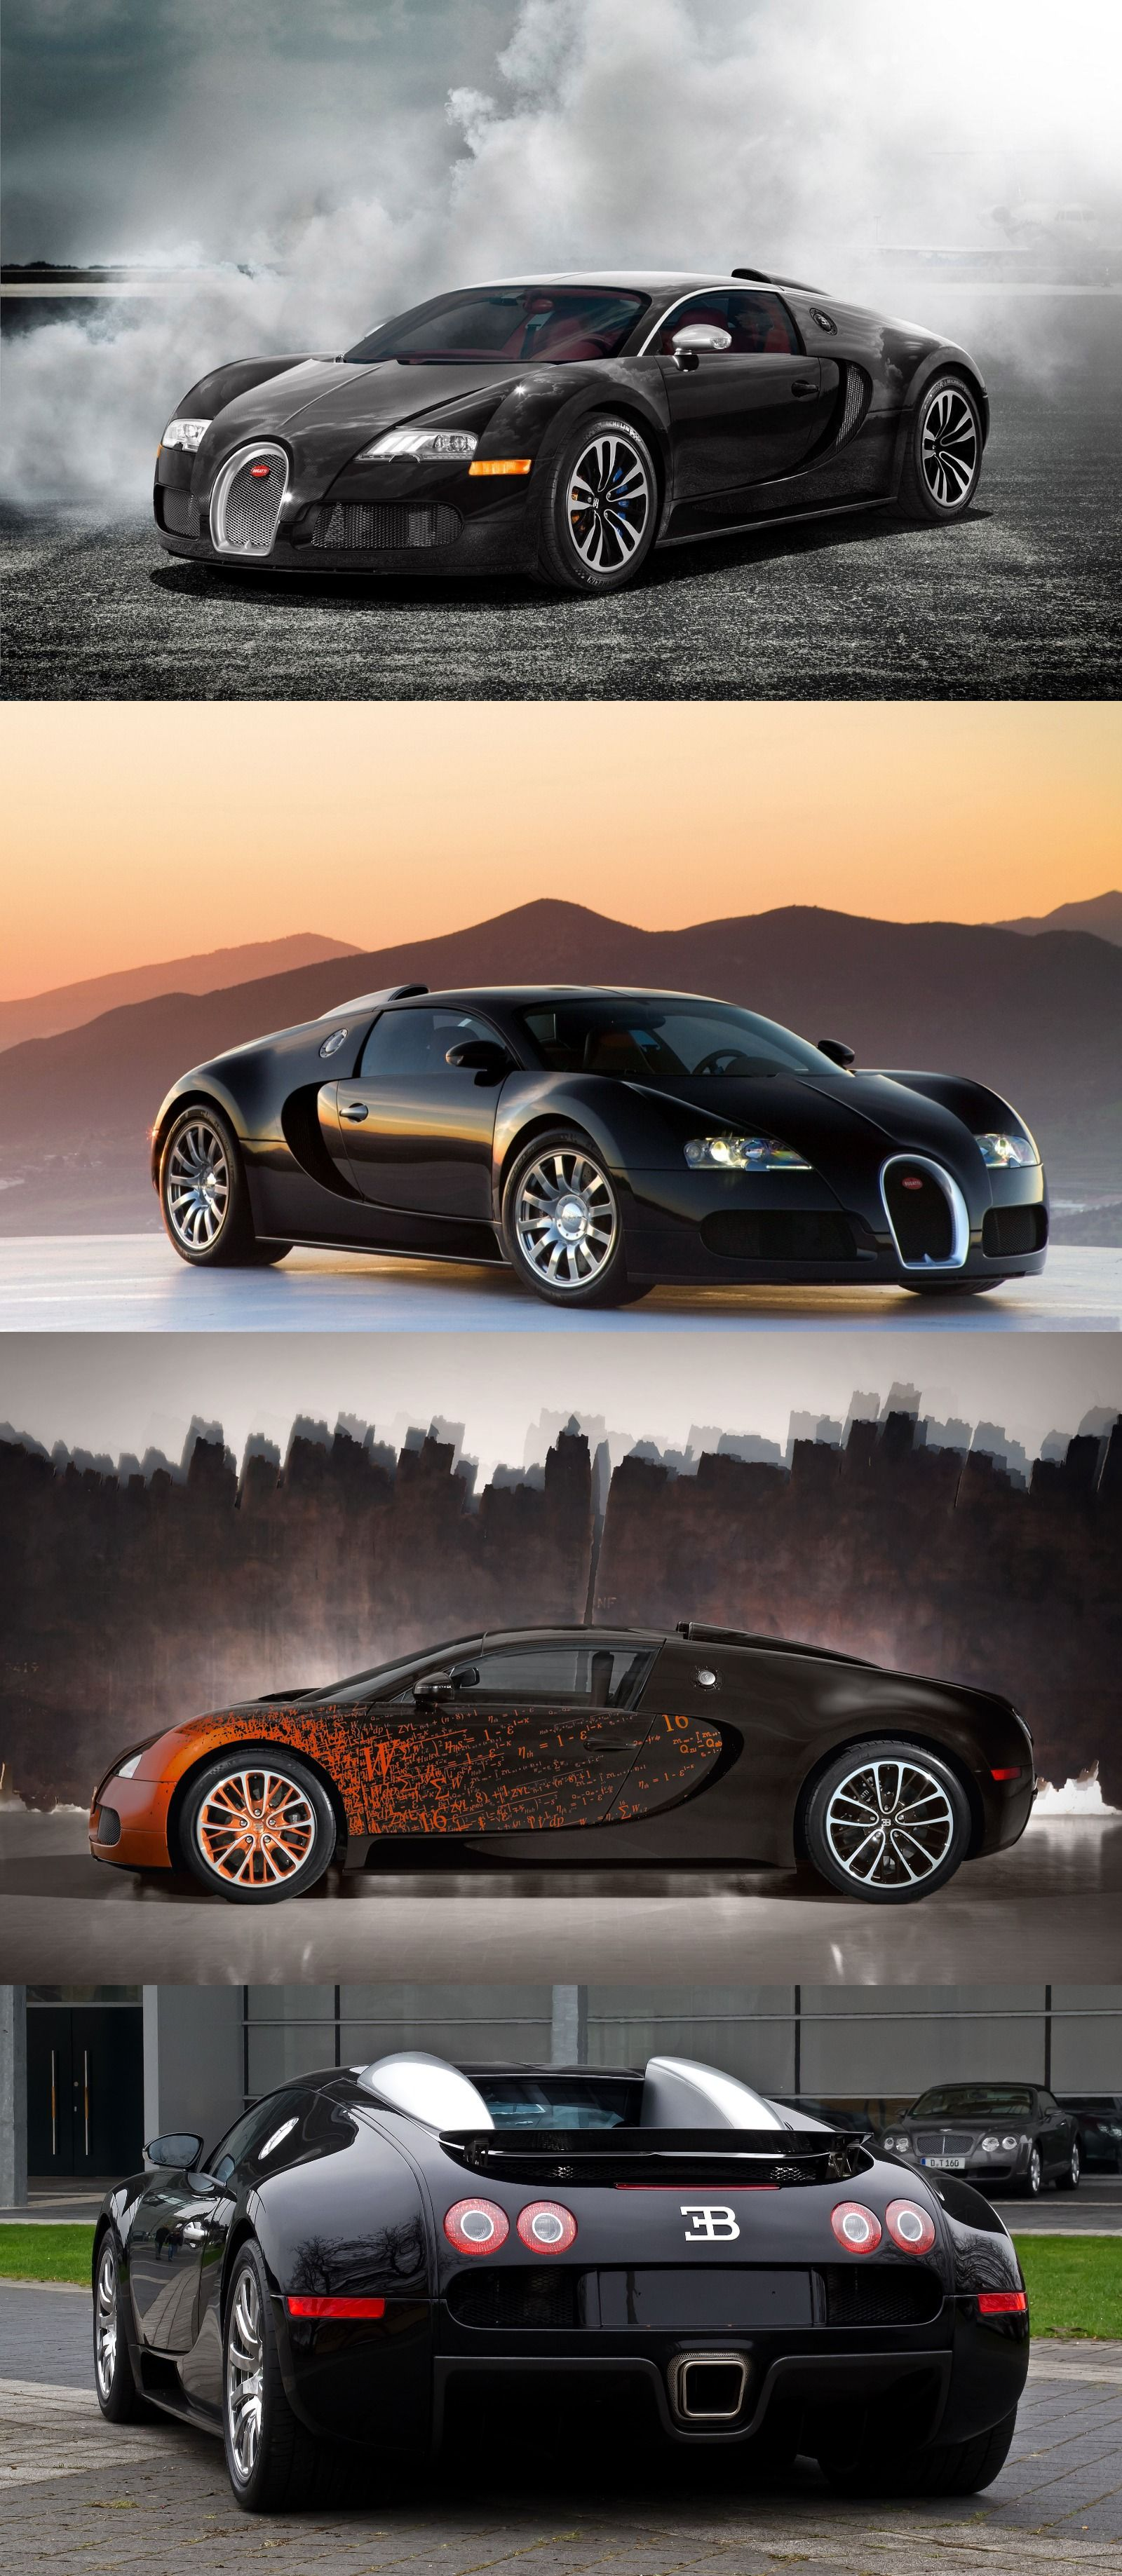 Bugatti Veyron Model Power Mileage Safety Colors Bugatti